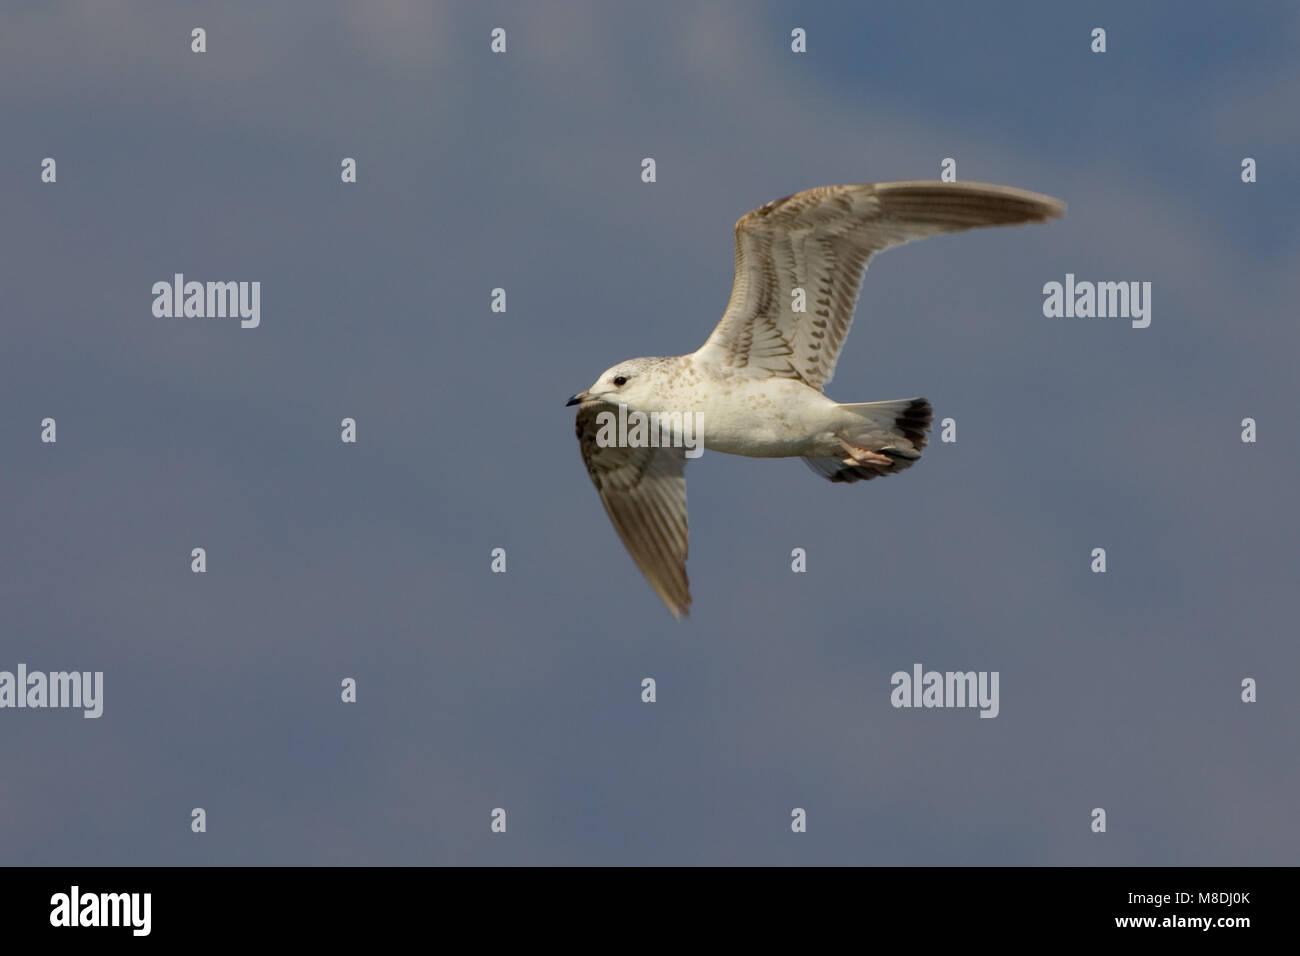 Onvolwassen Stormmeeuw in vlucht; Immature Common Gull in flight - Stock Image